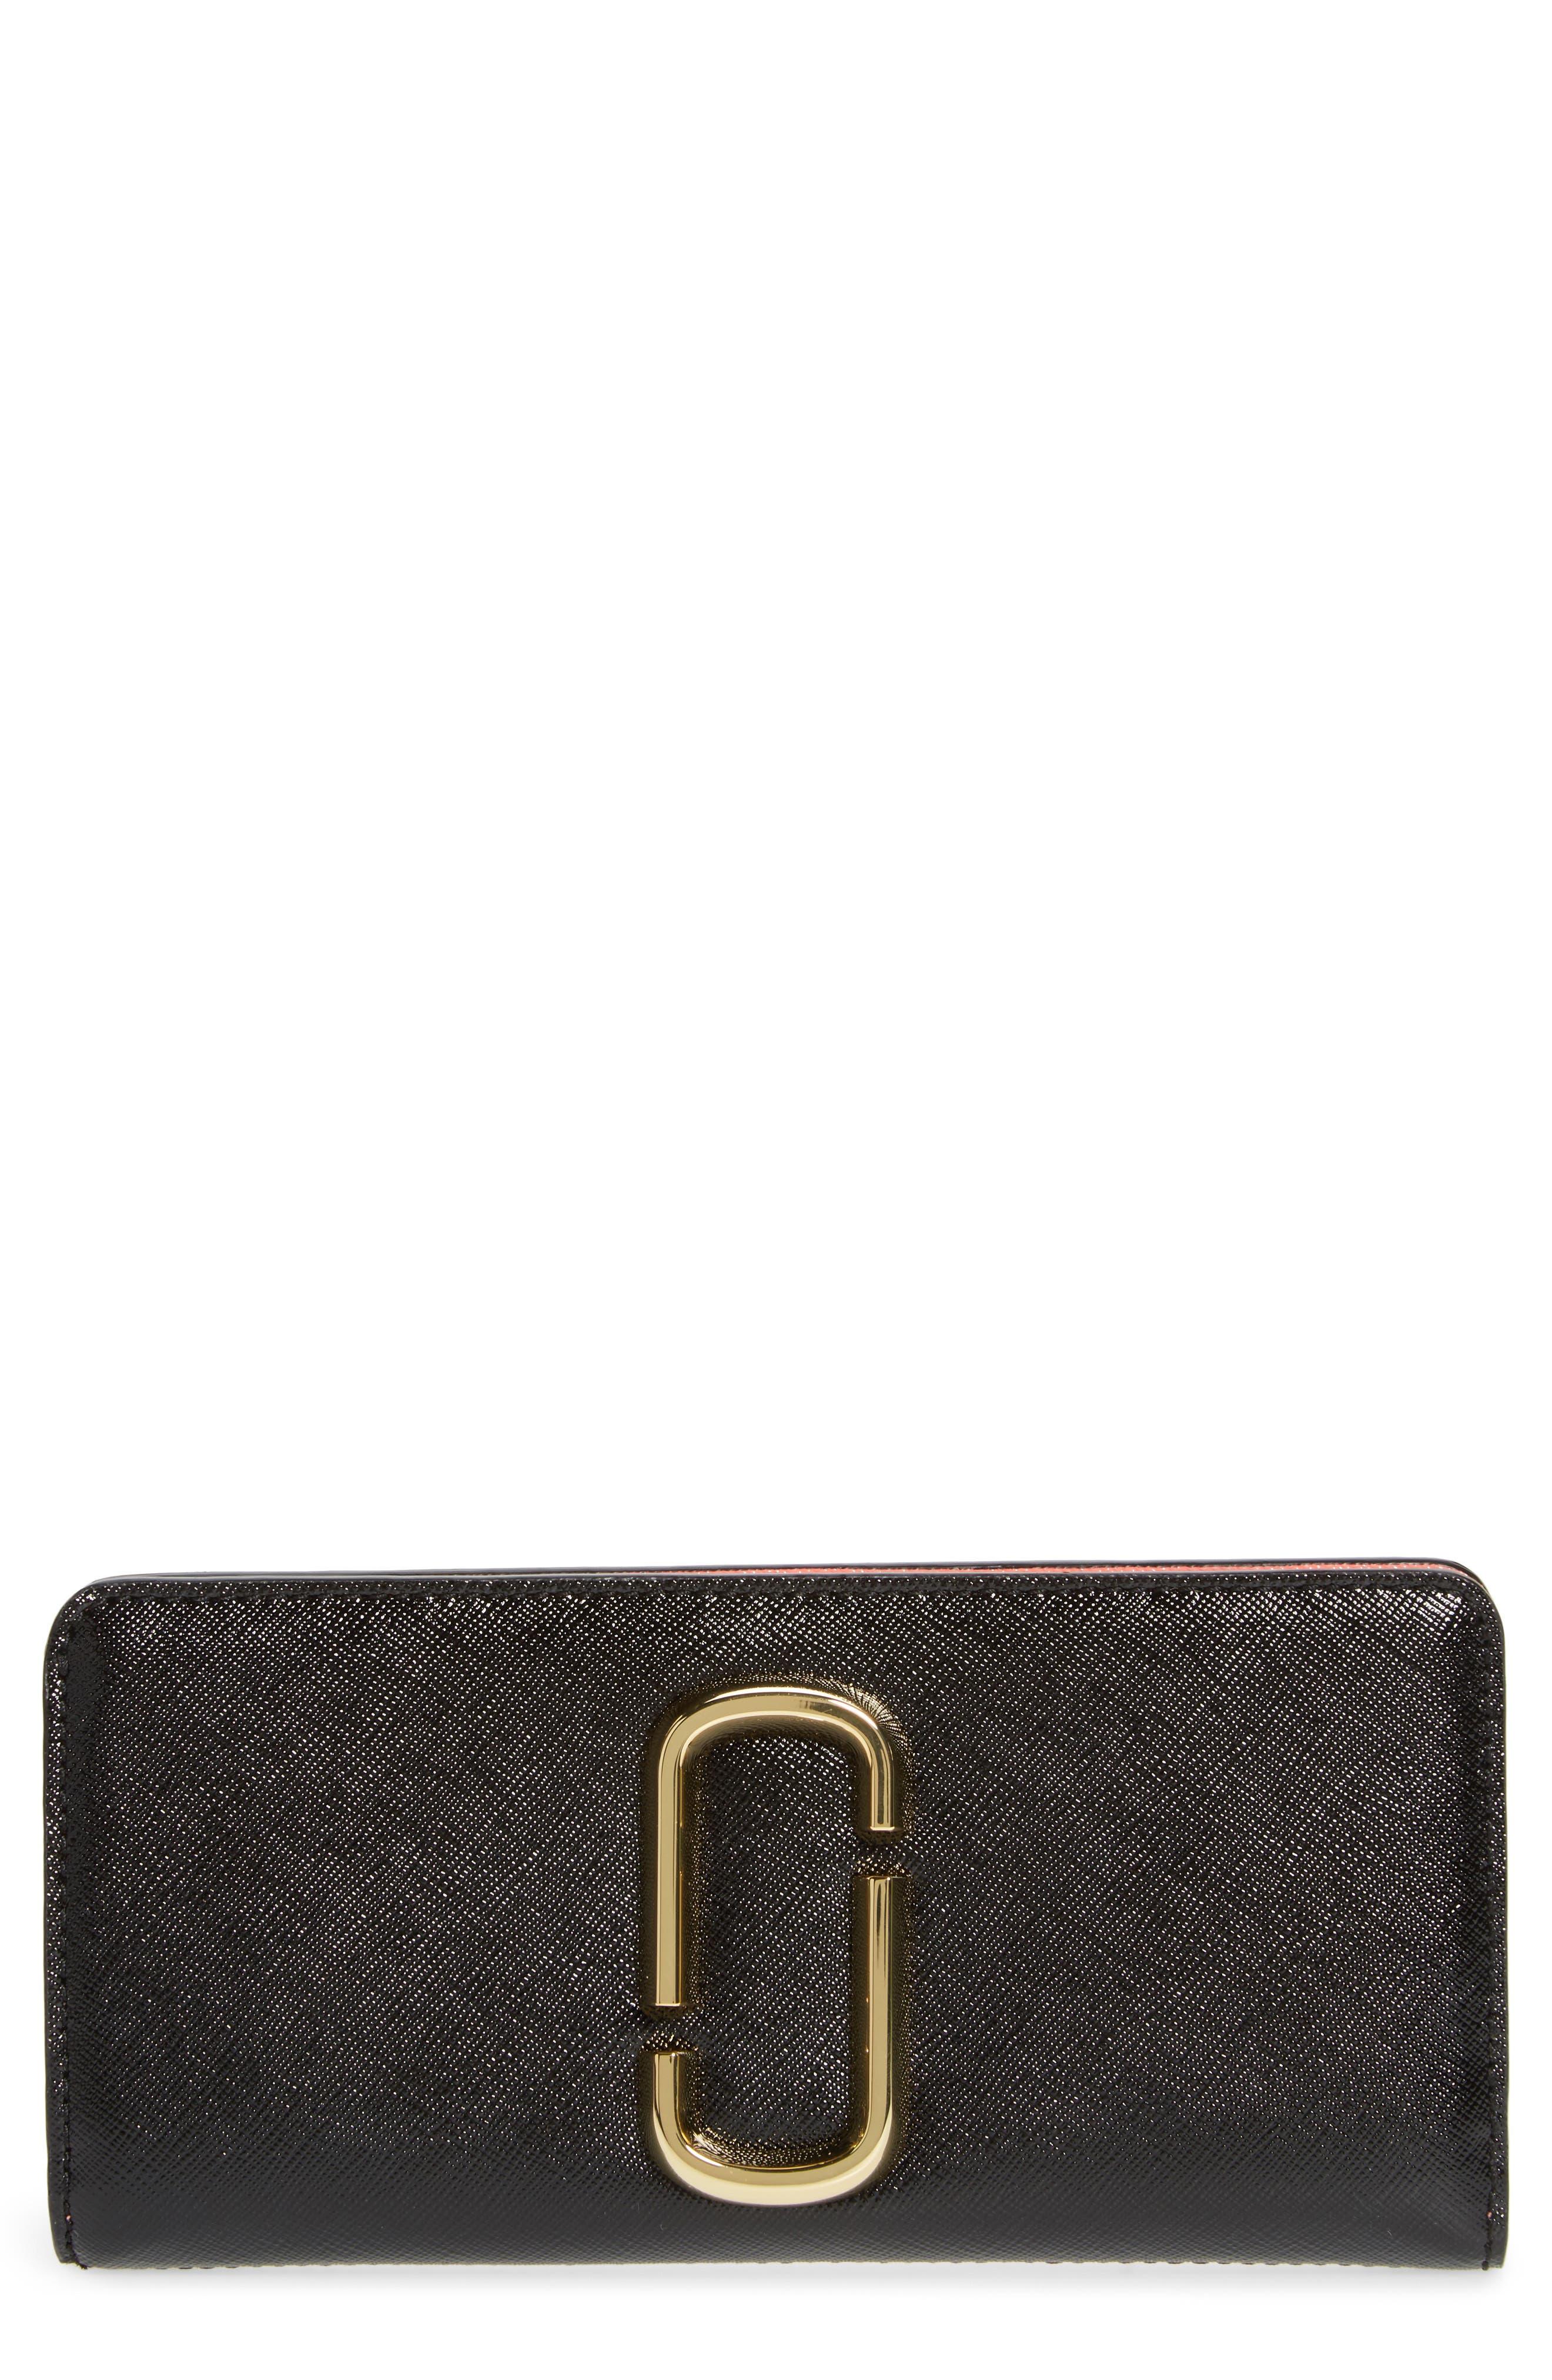 Snapshot Open Face Leather Wallet,                             Main thumbnail 1, color,                             BLACK/ ROSE